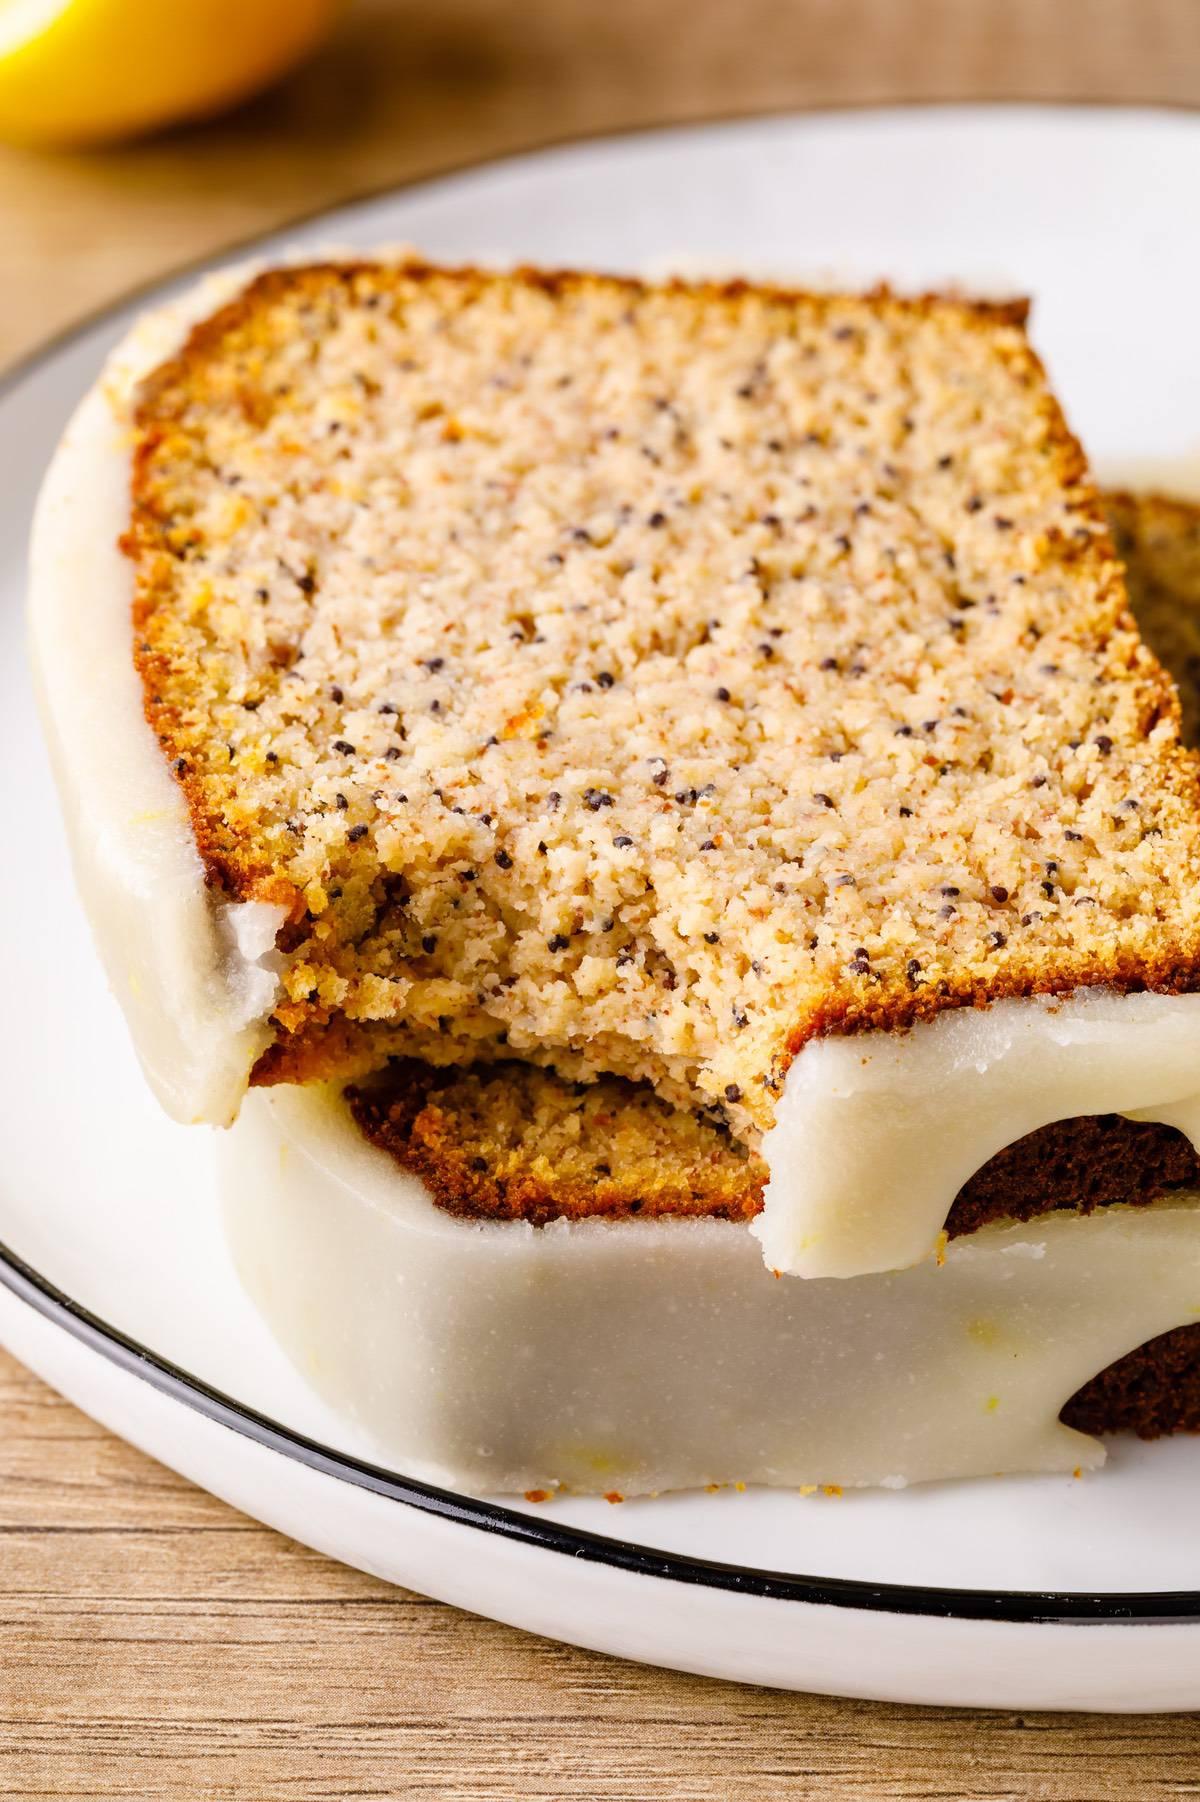 Home.fit lemon-poppy-seed-paleo-bread-8 Lemon Poppy Seed Bread (Low Carb)